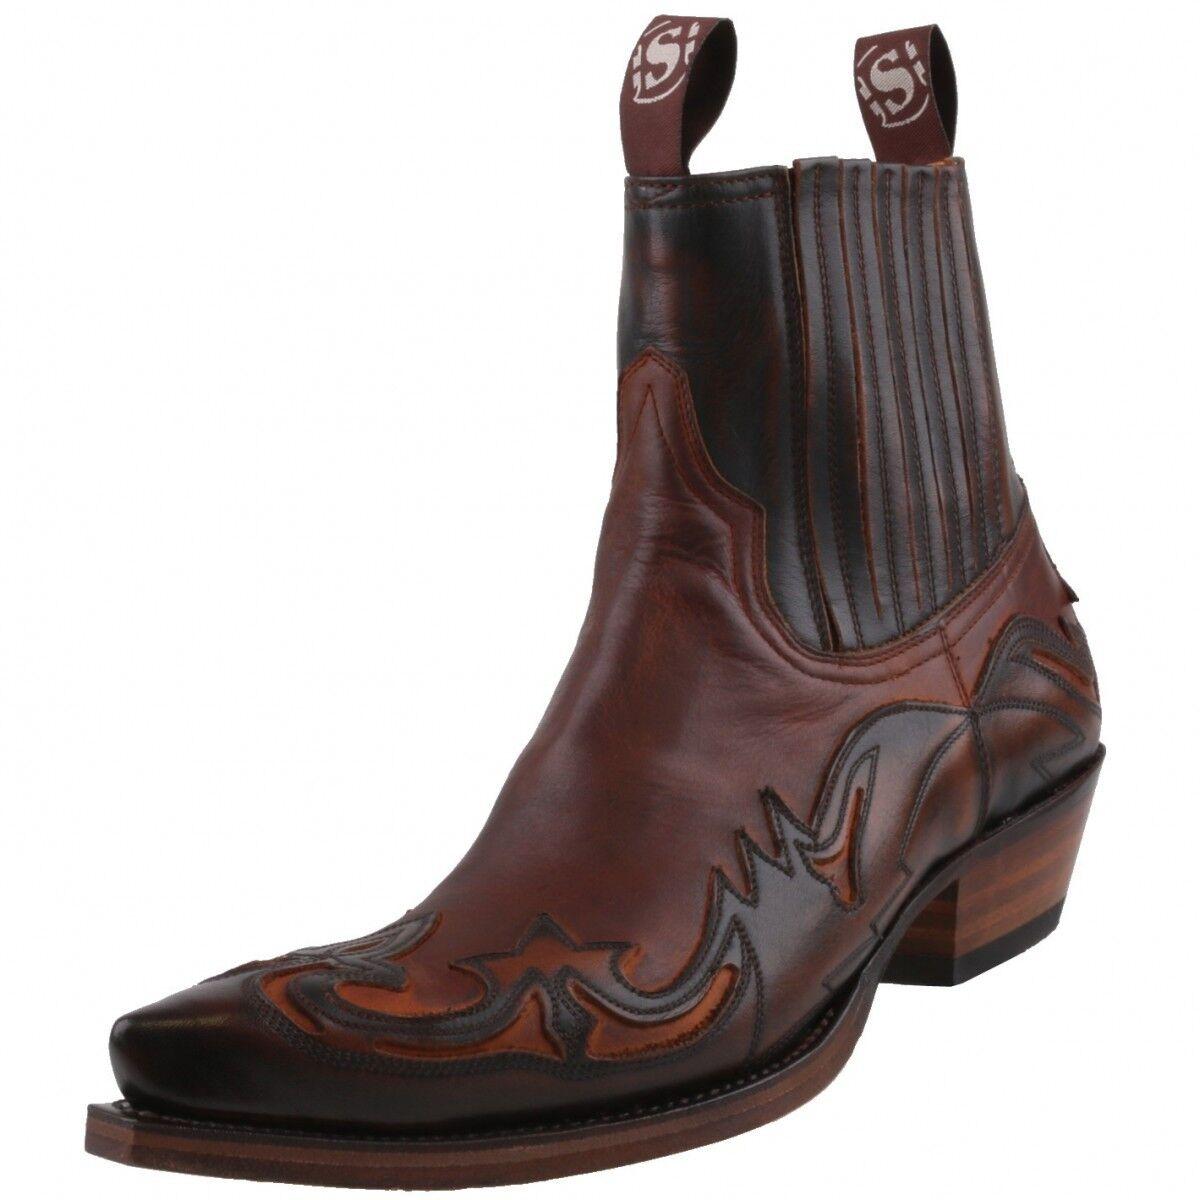 Neu SENDRA Stiefel Herrenschuhe 4660 Western-Stiefeletten Western-Stiefeletten Western-Stiefeletten Stiefel Leder Schuhe   eb6fbe